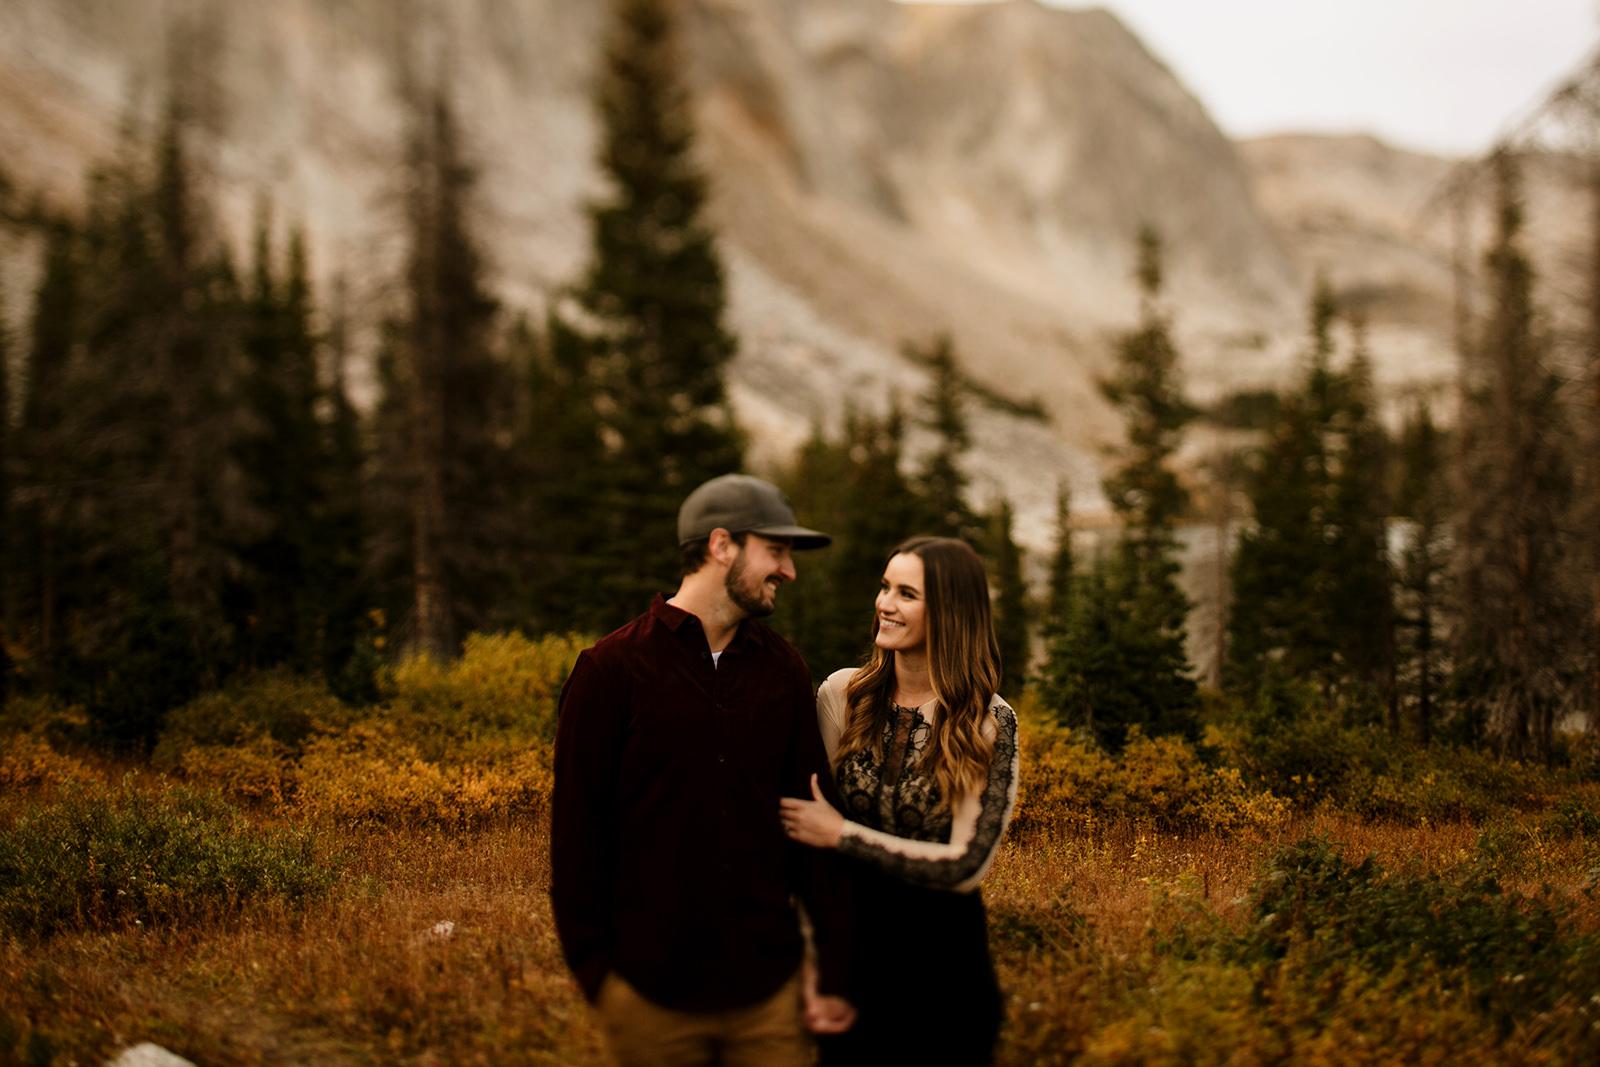 Liz Osban Photography Cheyenne Wyoming Engagement Wedding Photographer couple adventure elopement wedding laramie denver fort collins colorado rocky mountain national park23.jpg